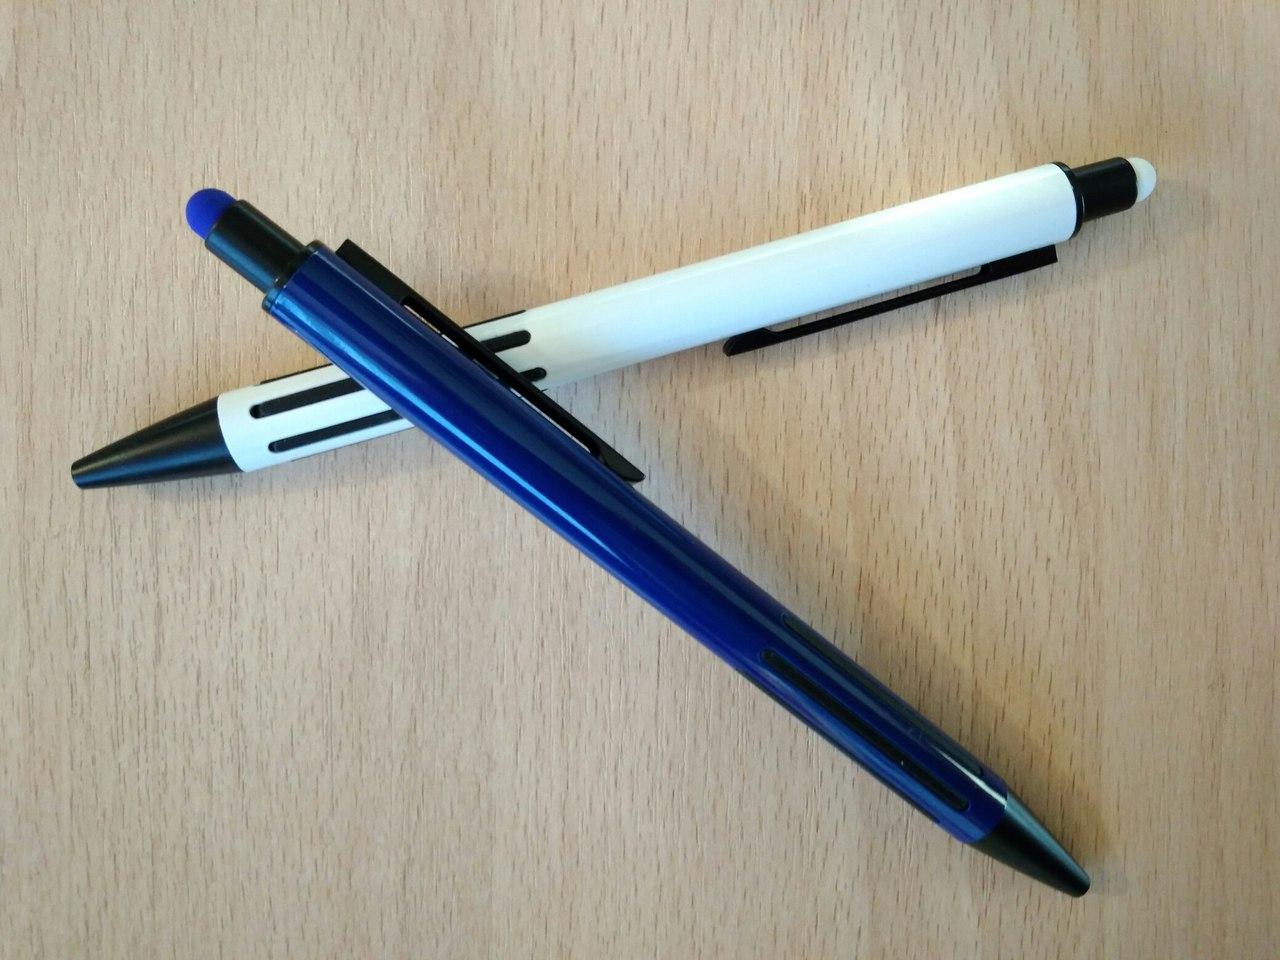 ручки со стилусом оптом